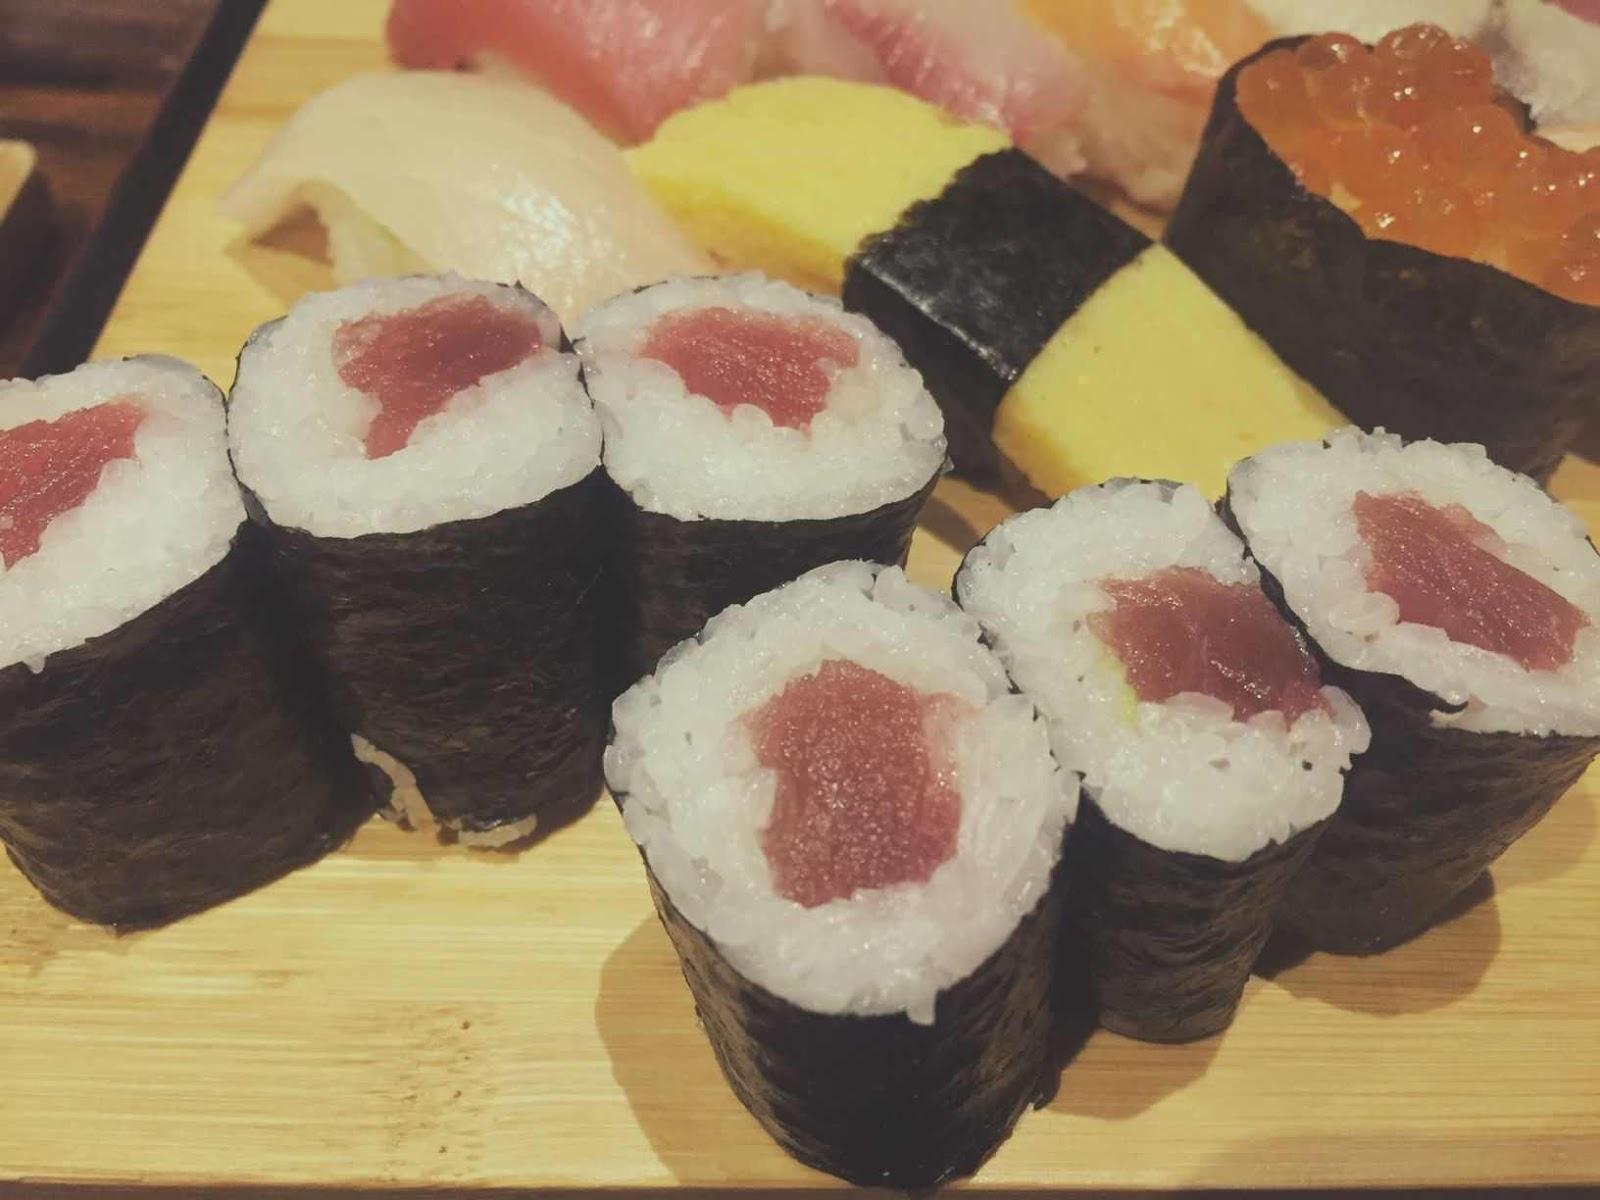 Ogawa Traditional Japanese Restaurant's tuna sashimi